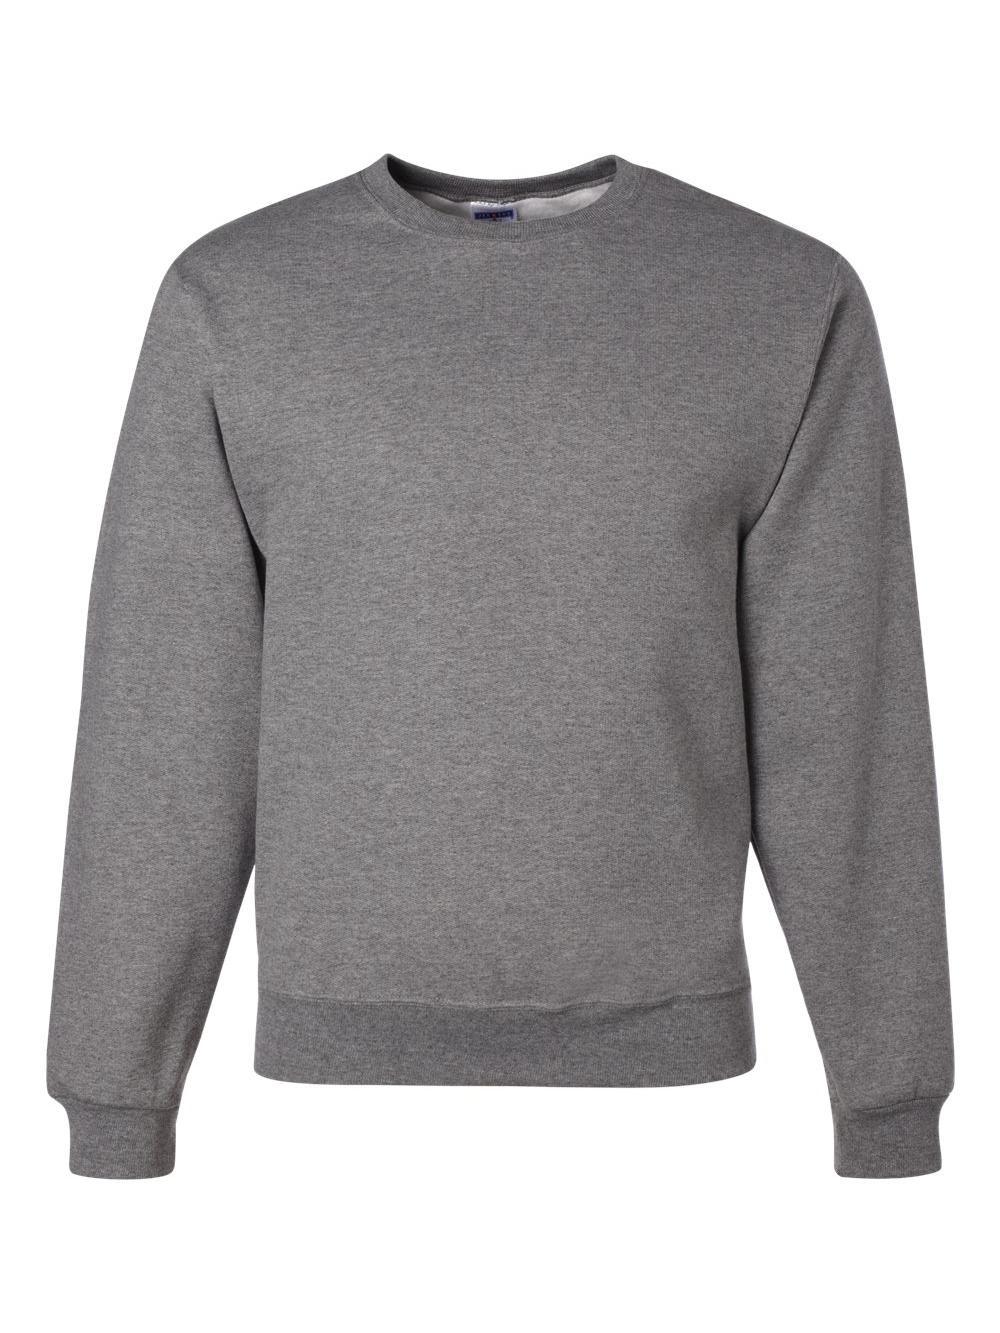 Jerzees-NuBlend-Crewneck-Sweatshirt-562MR thumbnail 69